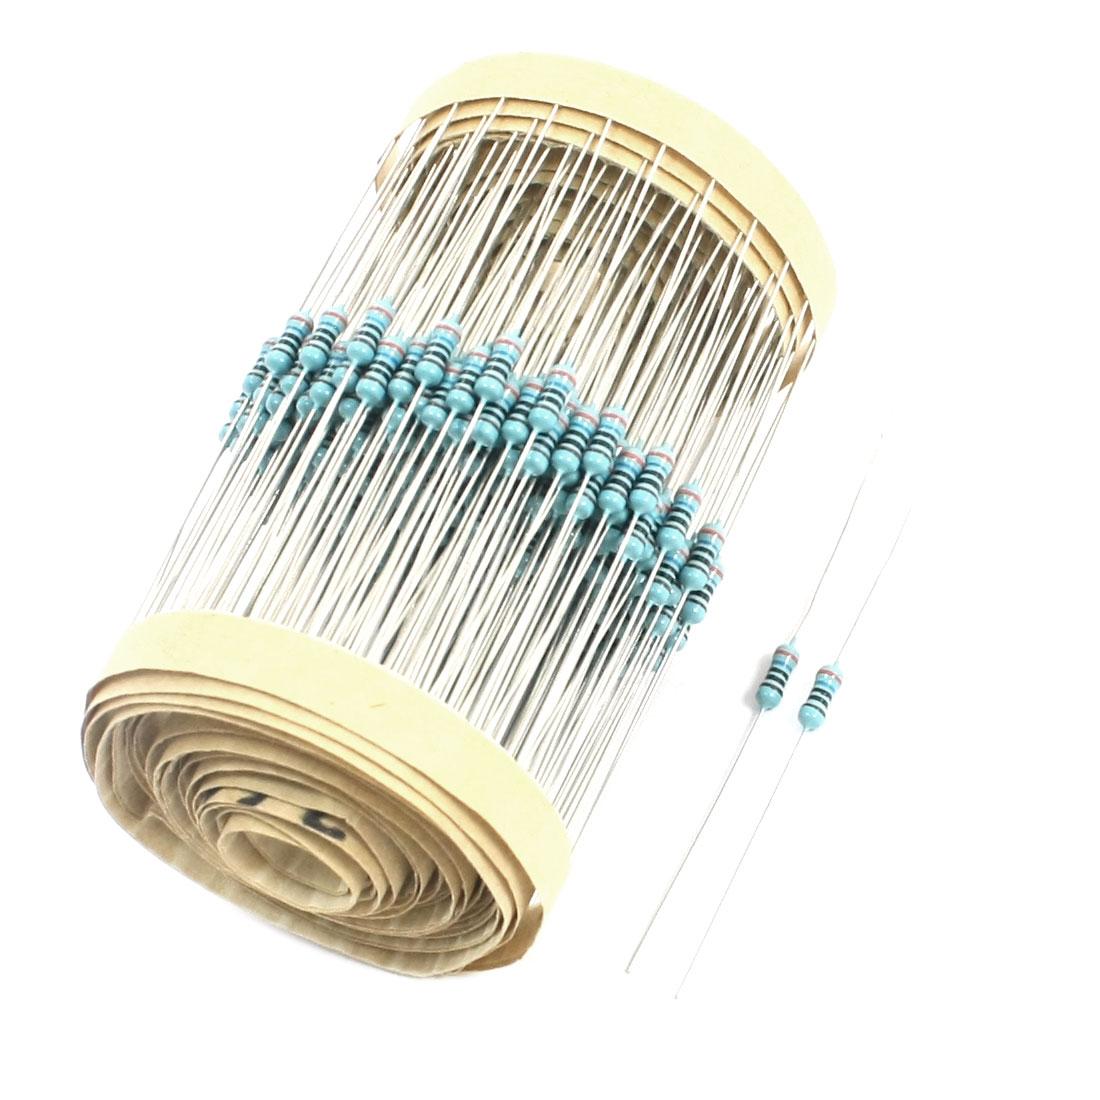 300PCS 0.25W 360 Ohm 1% Tolerance 6x2mm Axial Lead Metal Film Resistor